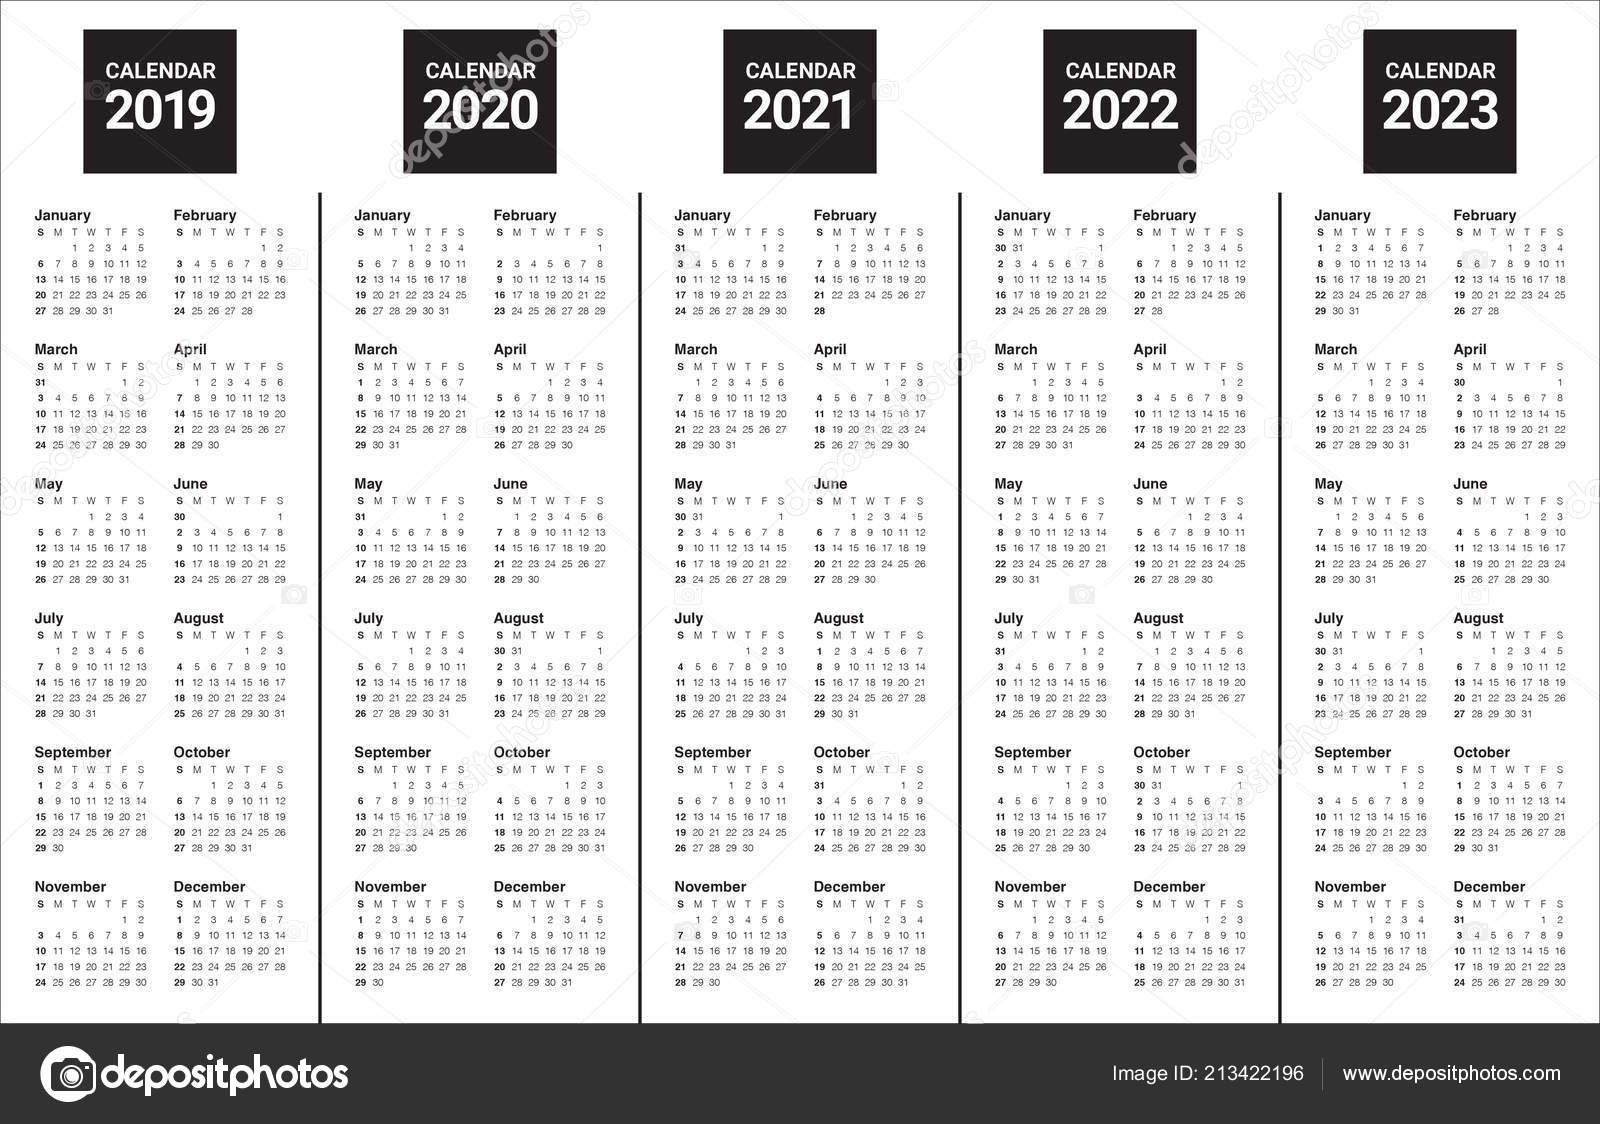 Year 2019 2020 2021 2022 2023 Calendar Vector Design intended for Yearly Calendar 2020 2021 2022 2023